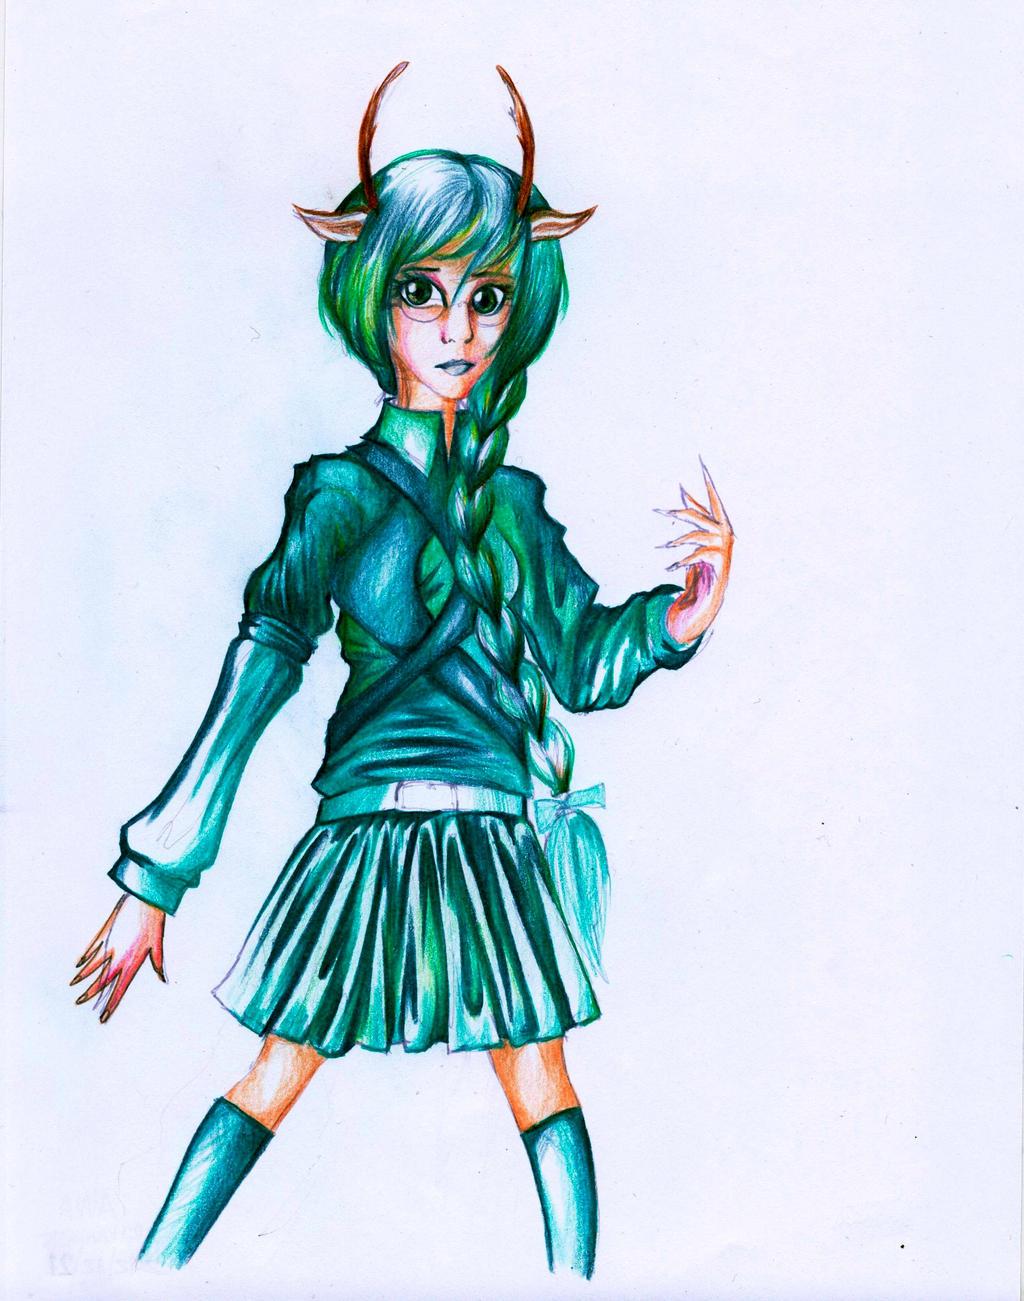 Awa - concept outfit by Antervantei